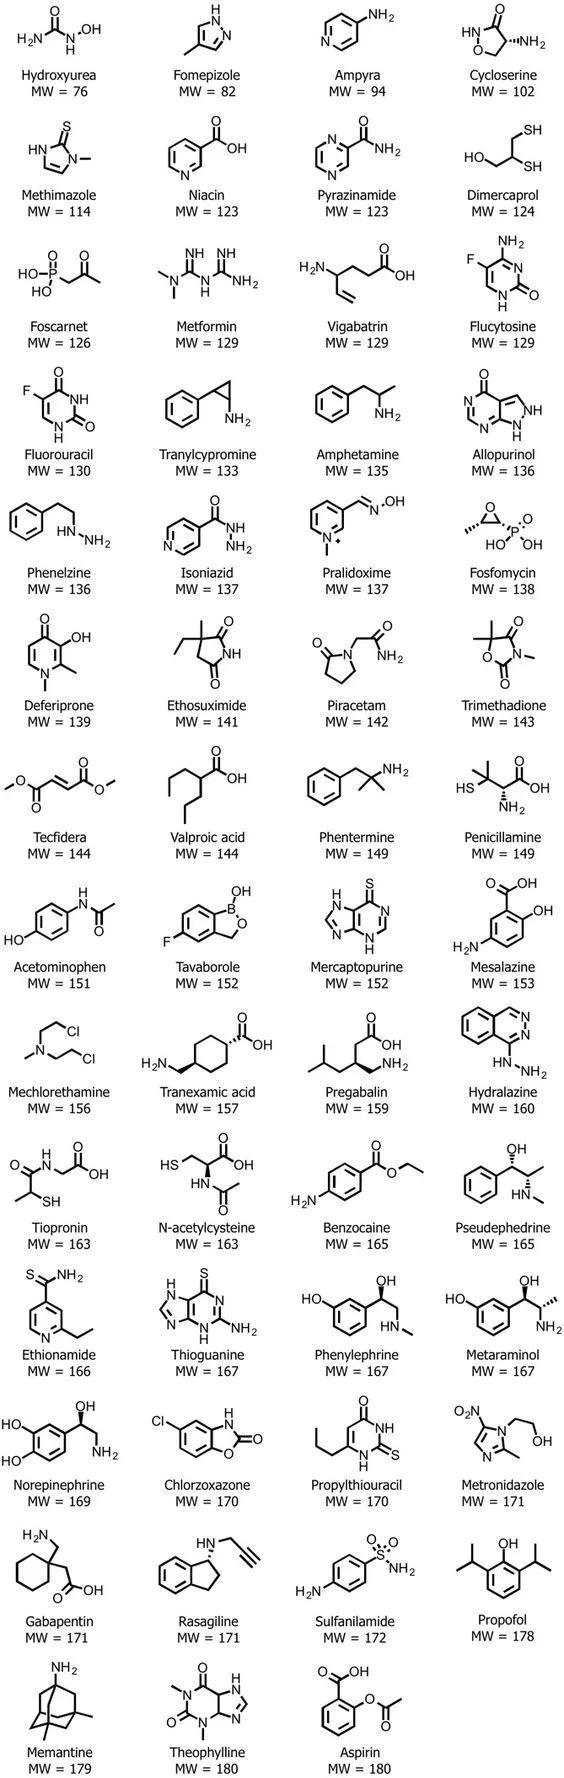 Useful cheat sheet for Org Chem 1/Org Chem 2 final exam - #1Org